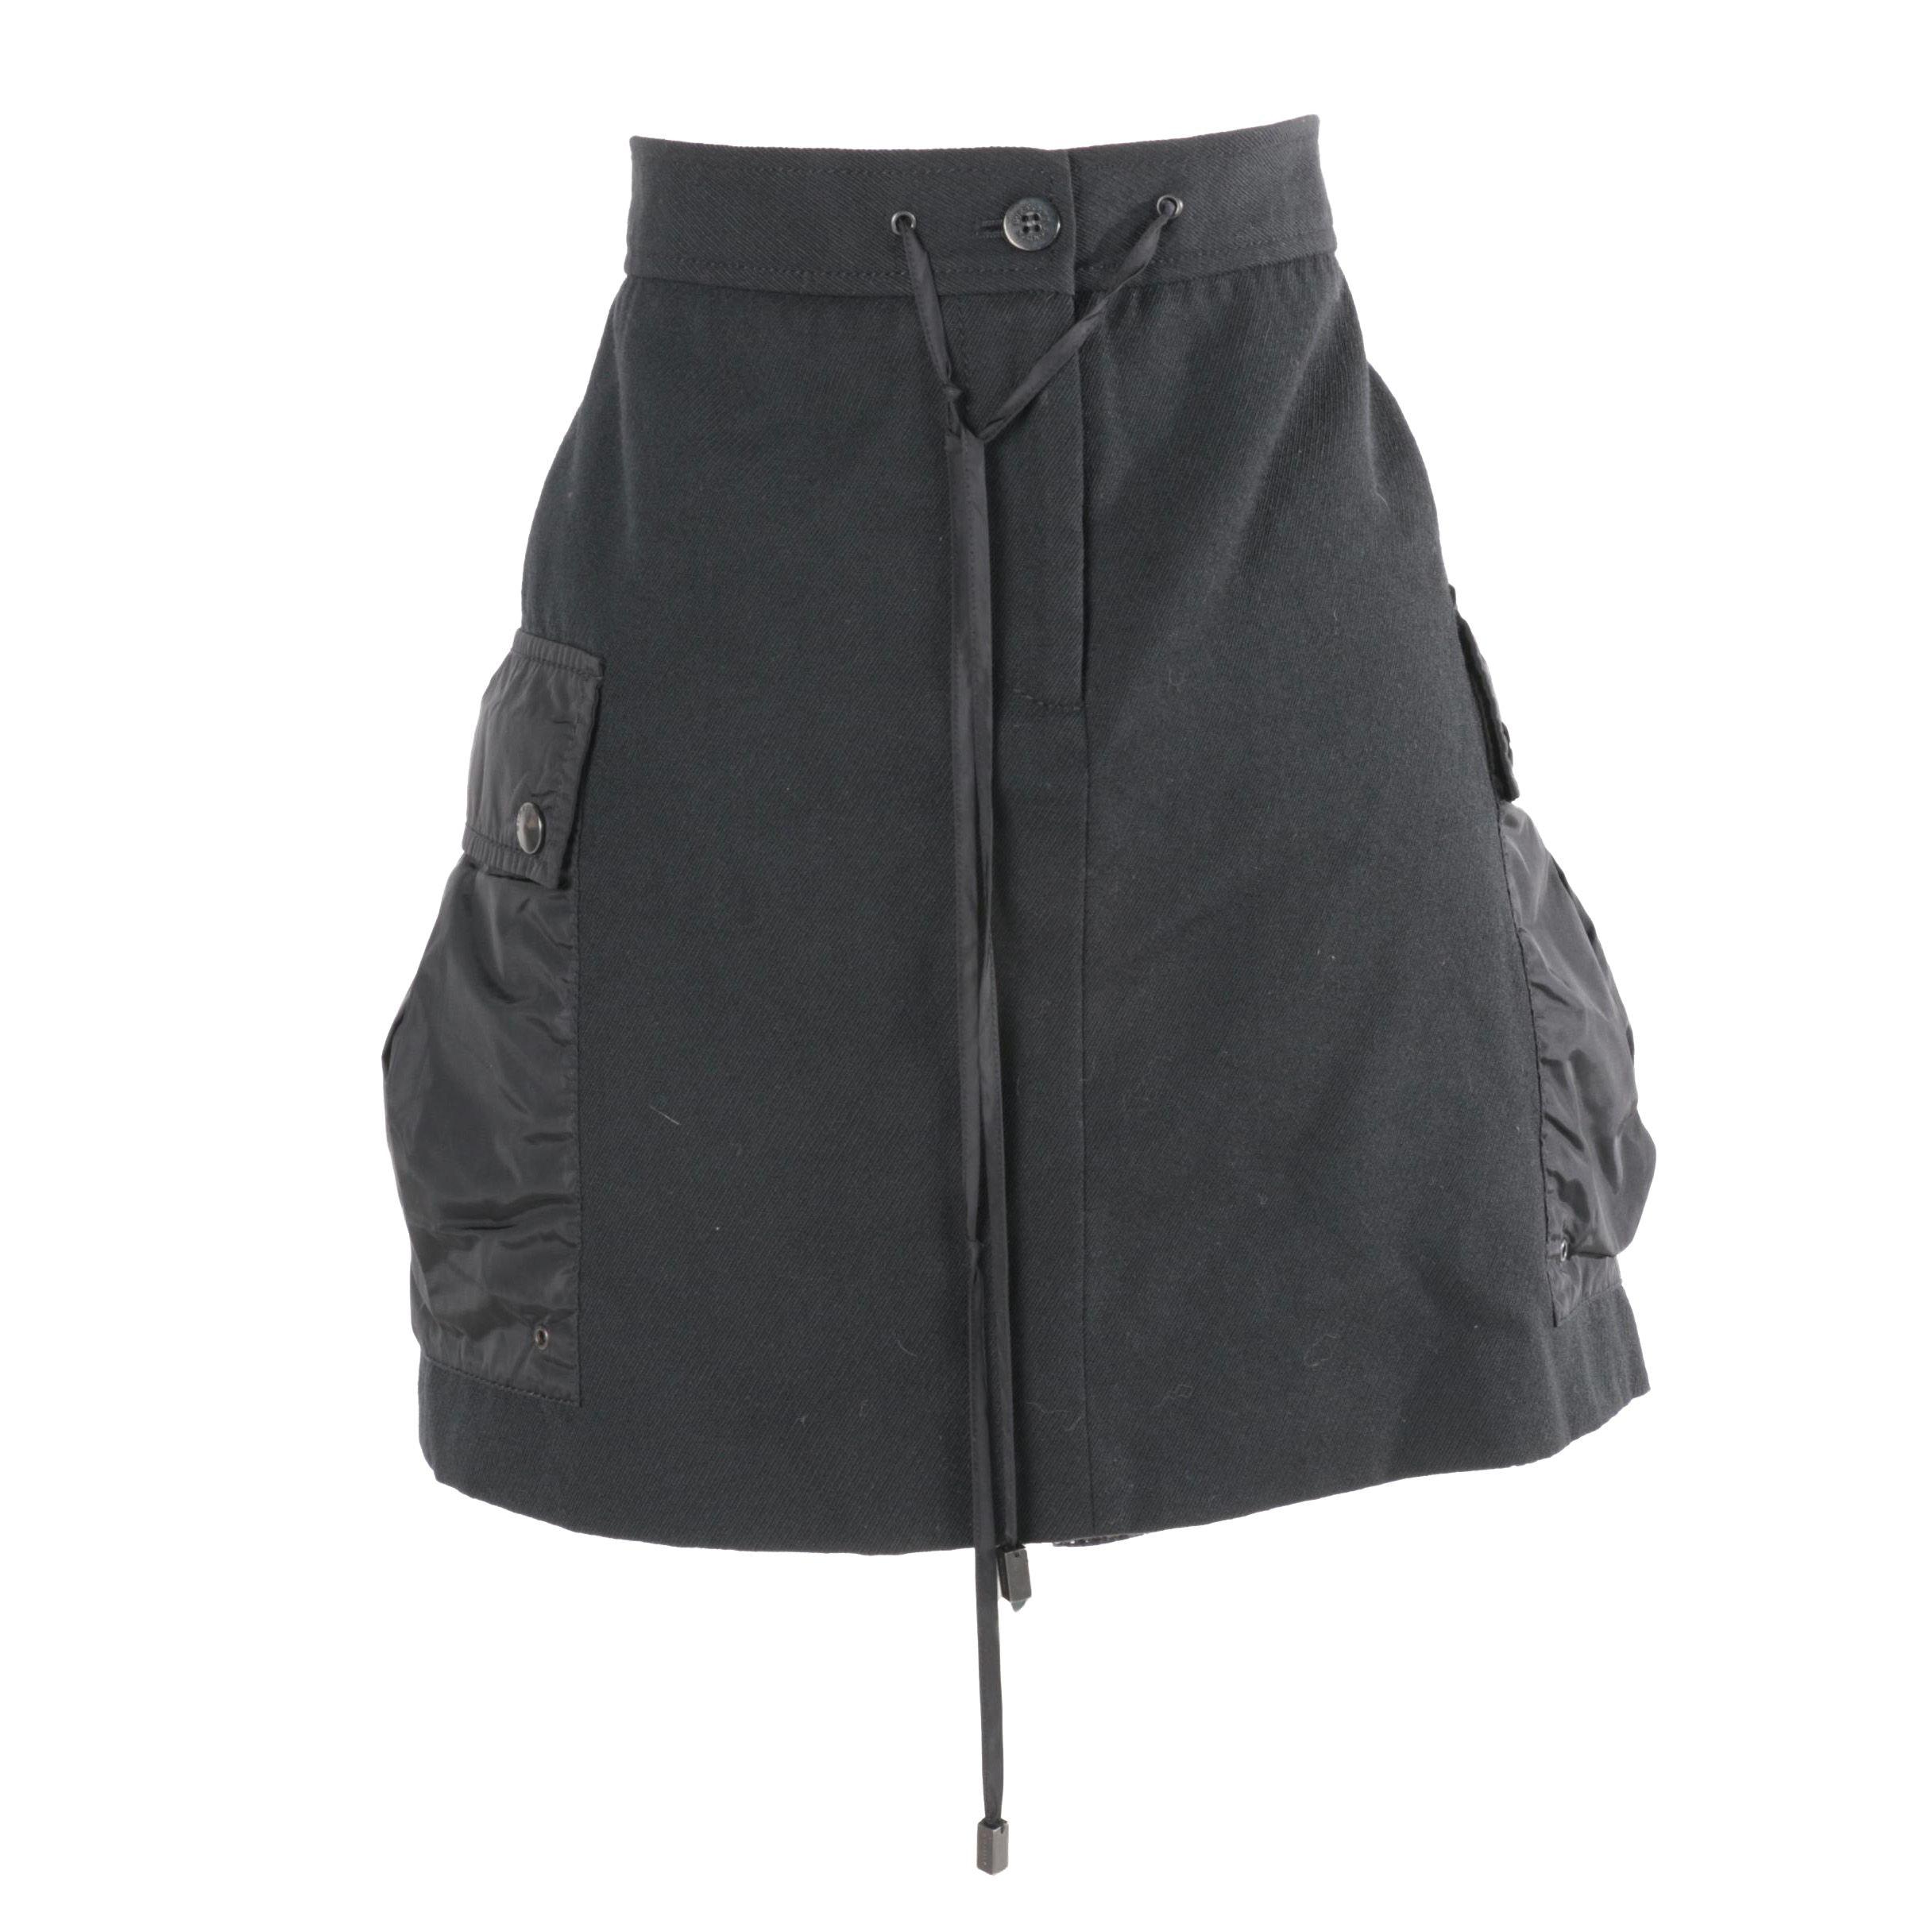 Burberry Wool Blend Sporty Drawstring Skirt